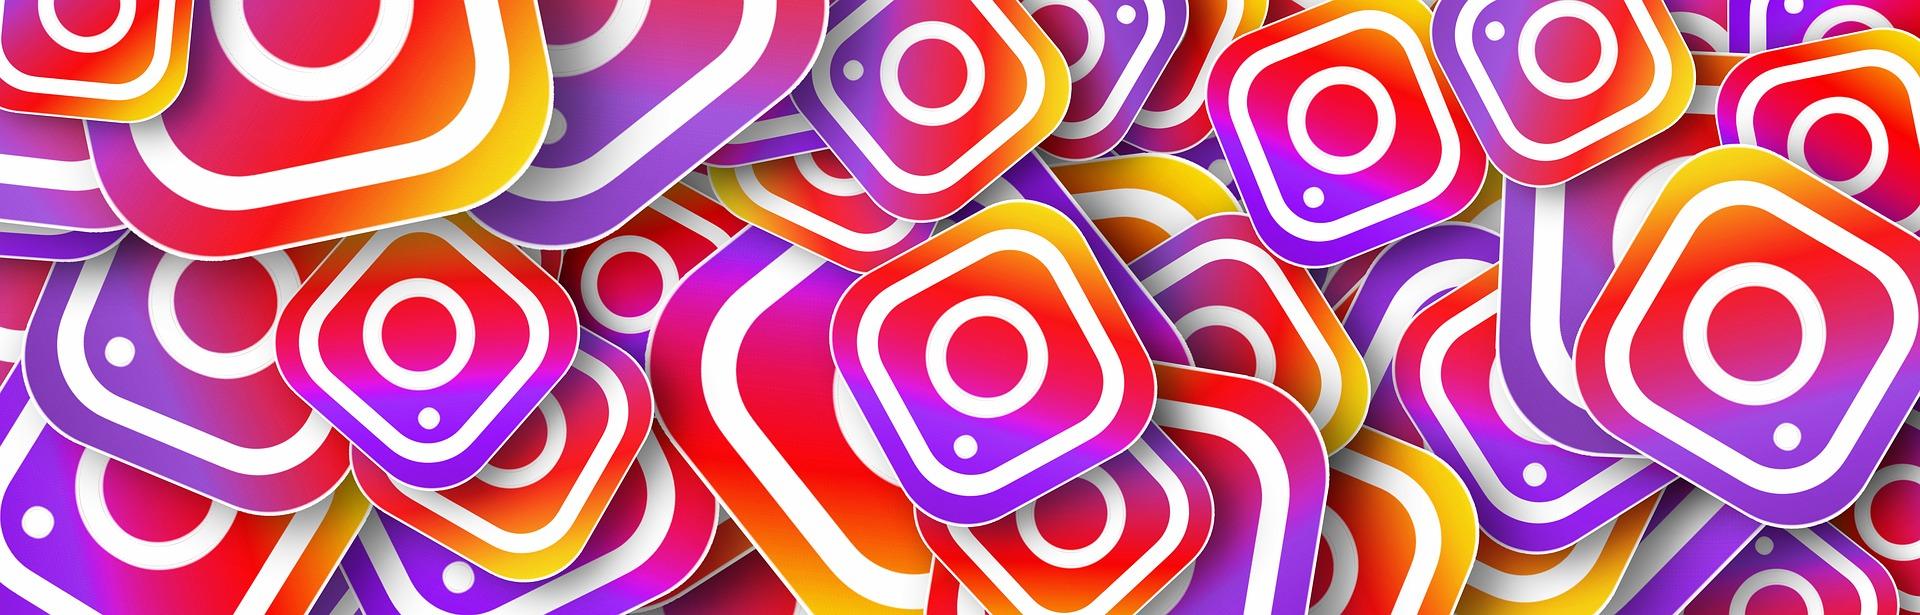 instagram 3319588 1920